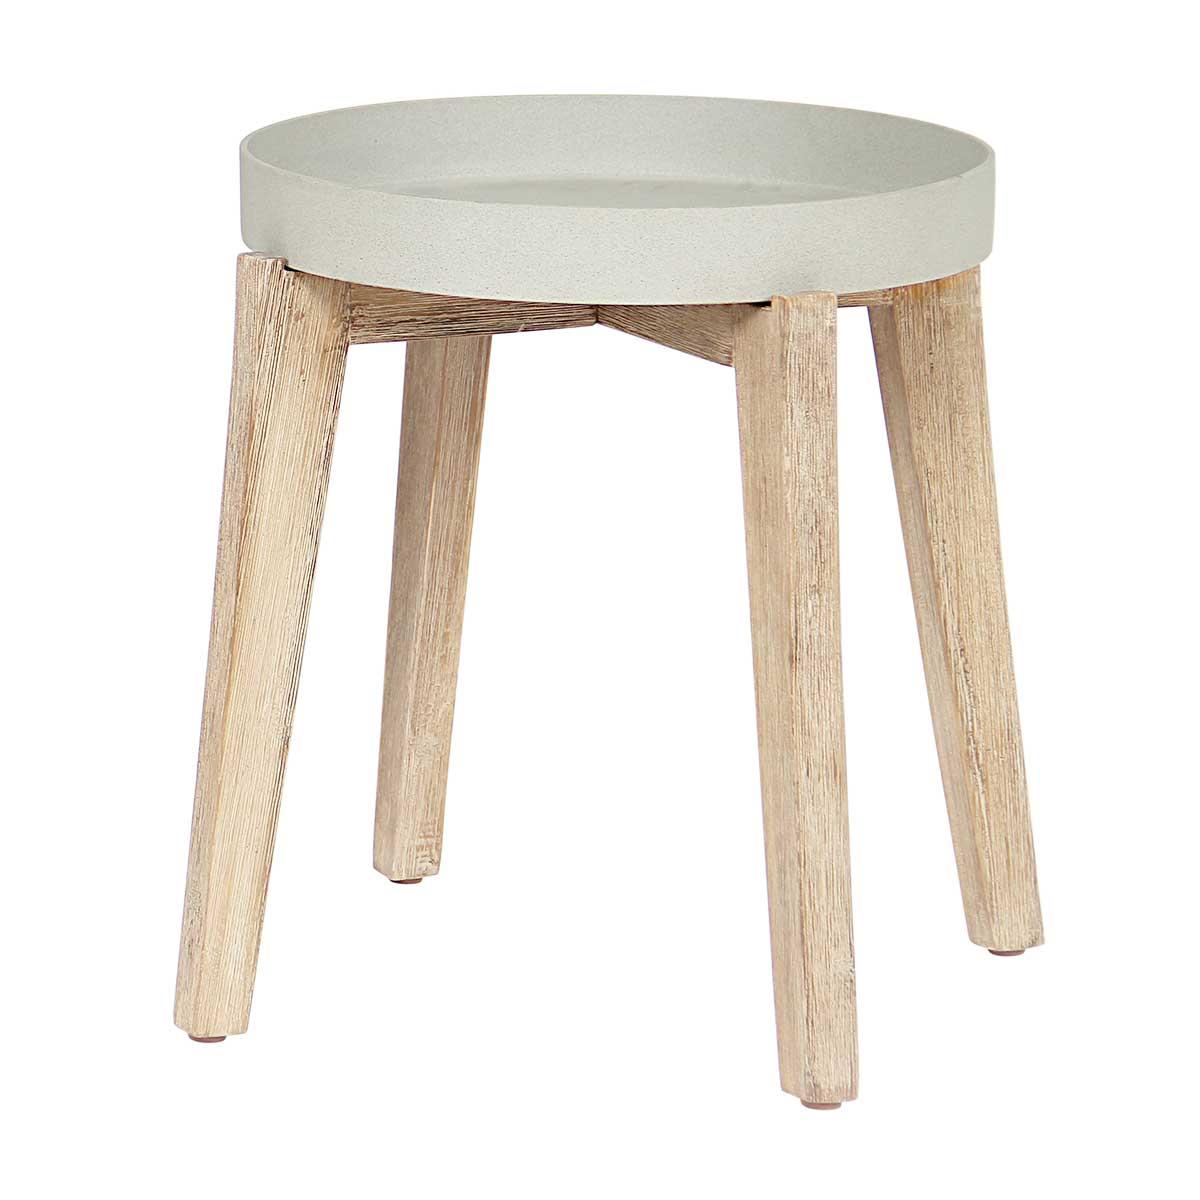 Table basse gypso naturel en bois et grès sandstone